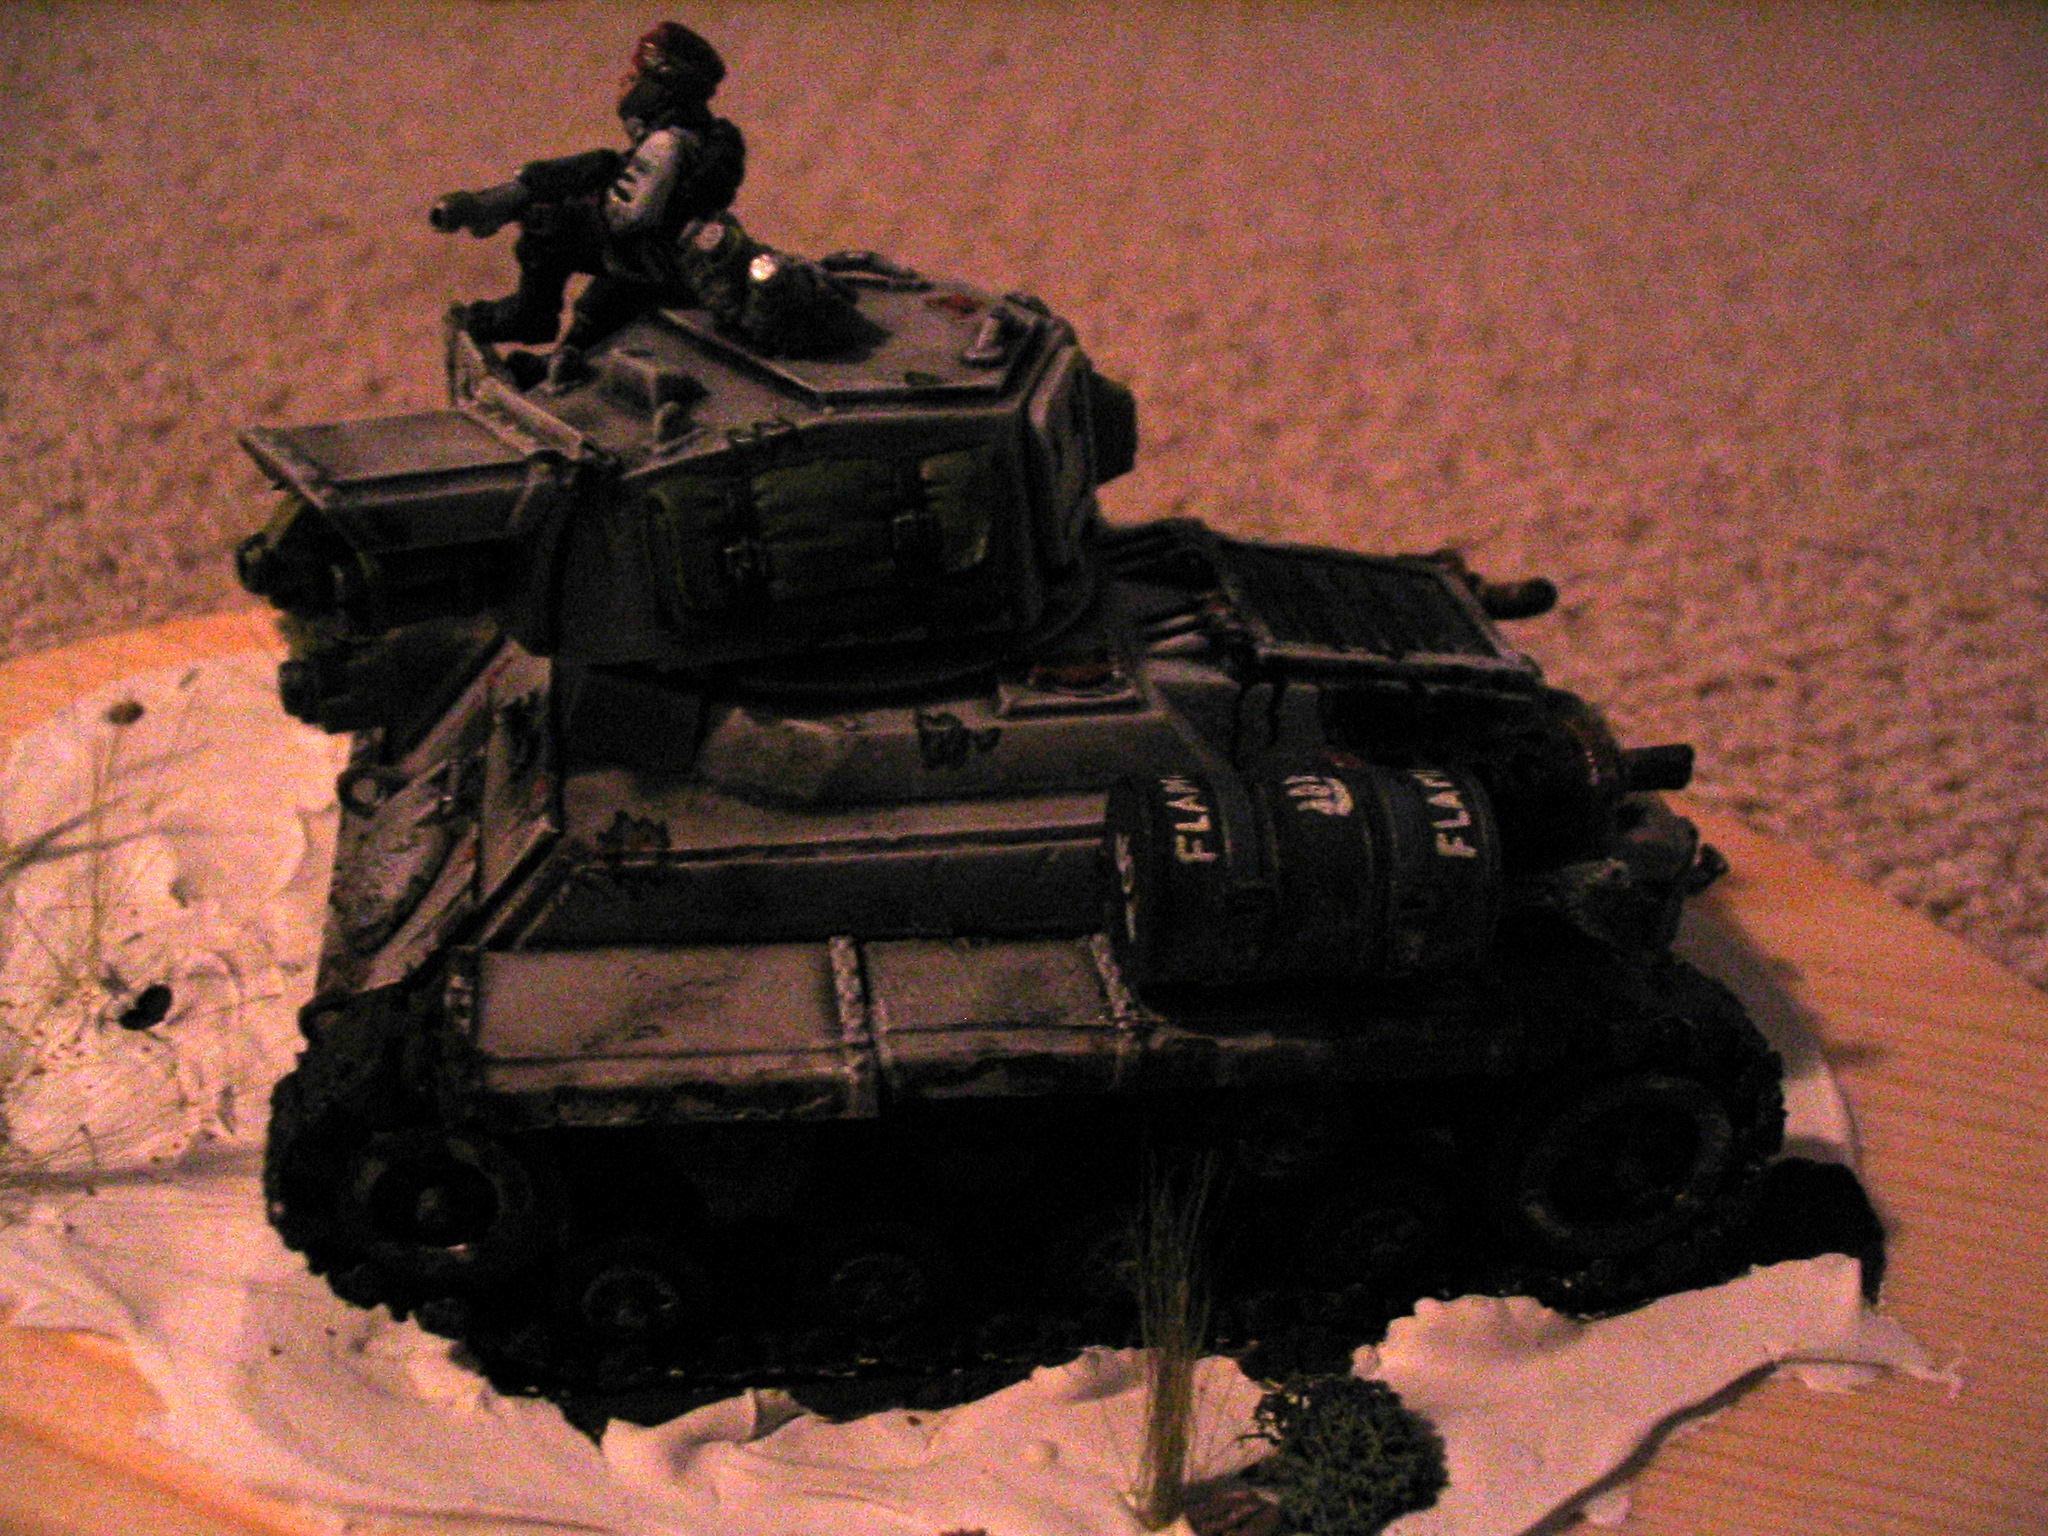 Conversion, Leman Russ, Leman Russ Punisher, Modification, Mods, Punisher, Tank